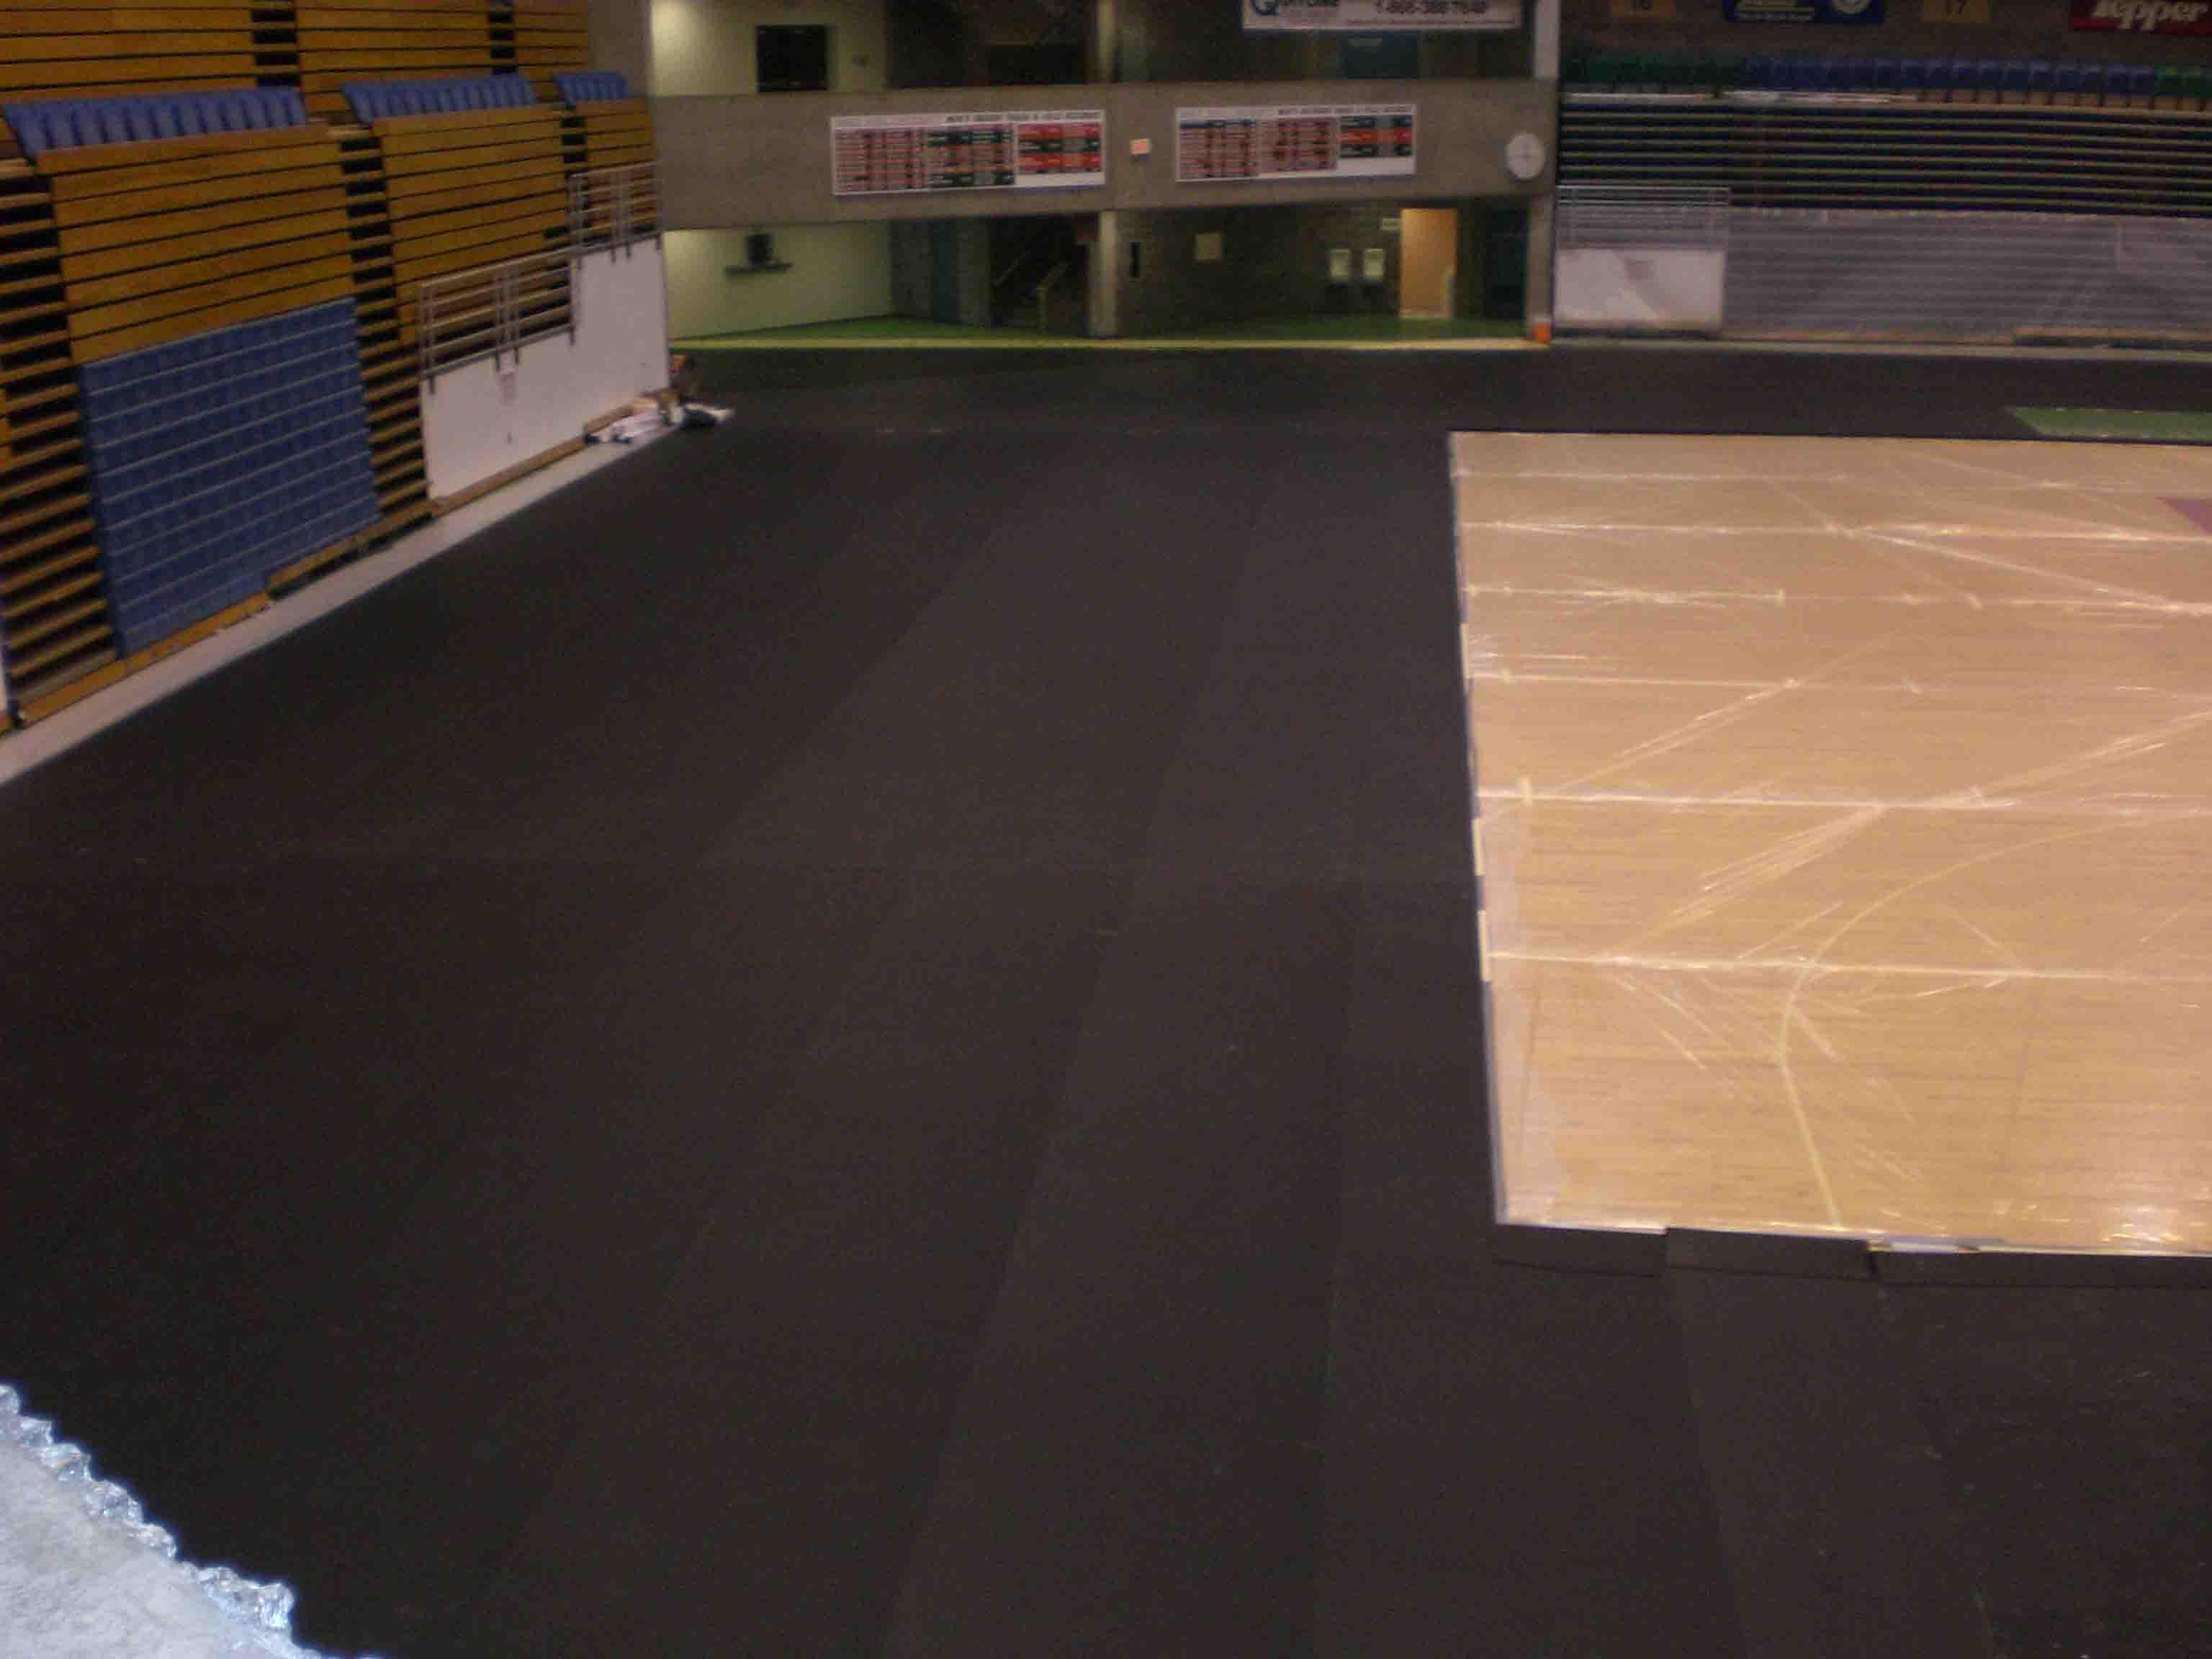 Basketball Court Construction Indoor Basketball Court